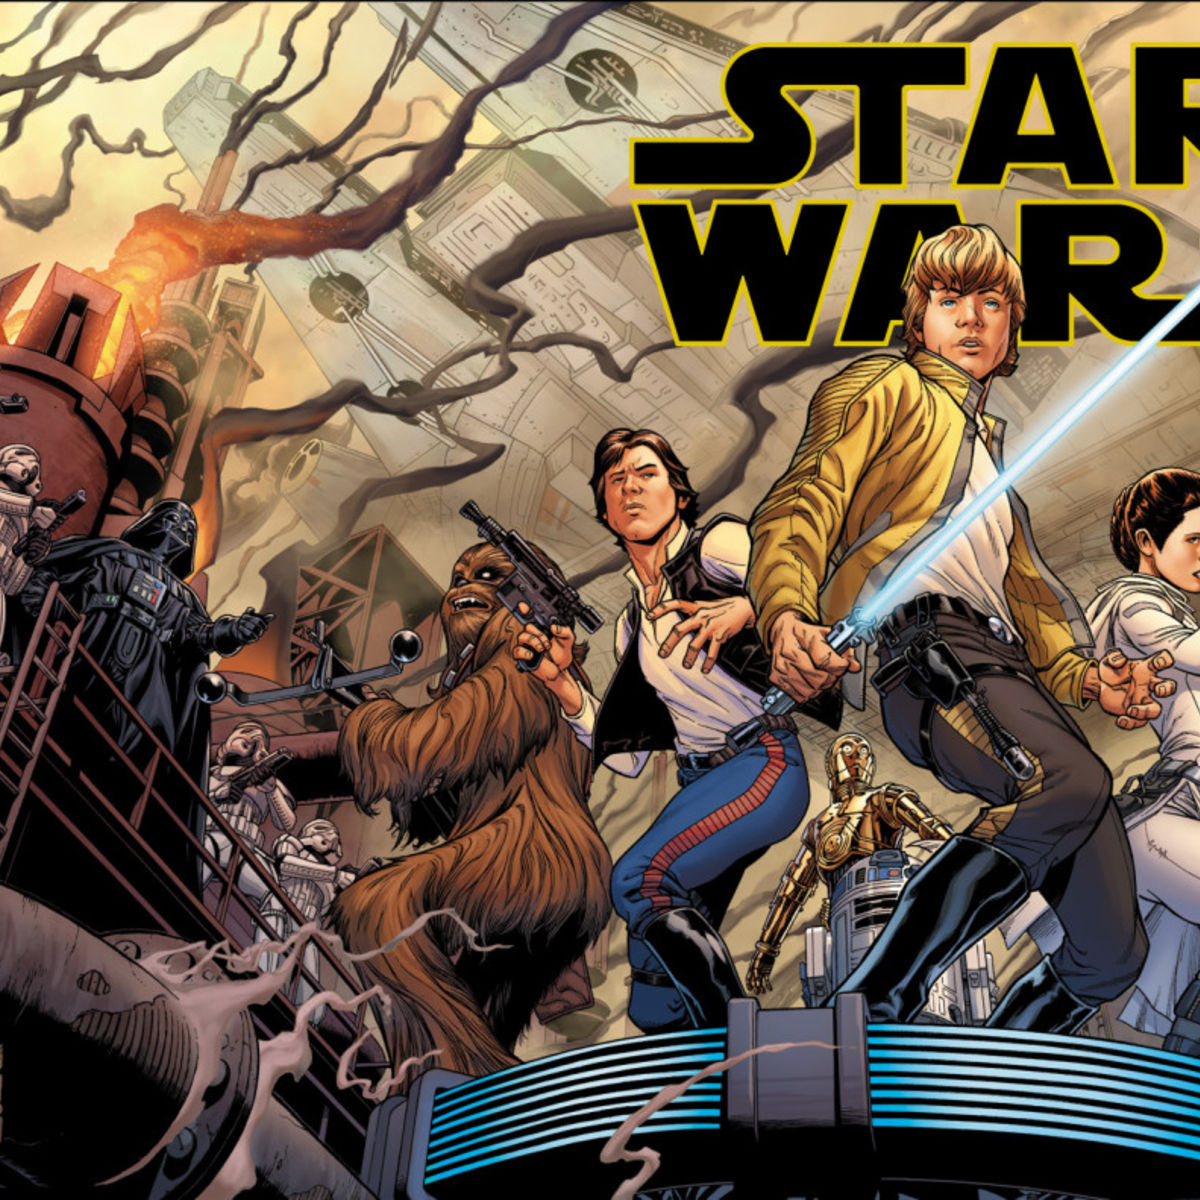 star-wars-1-joe-quesada-cover-1024x791.jpg